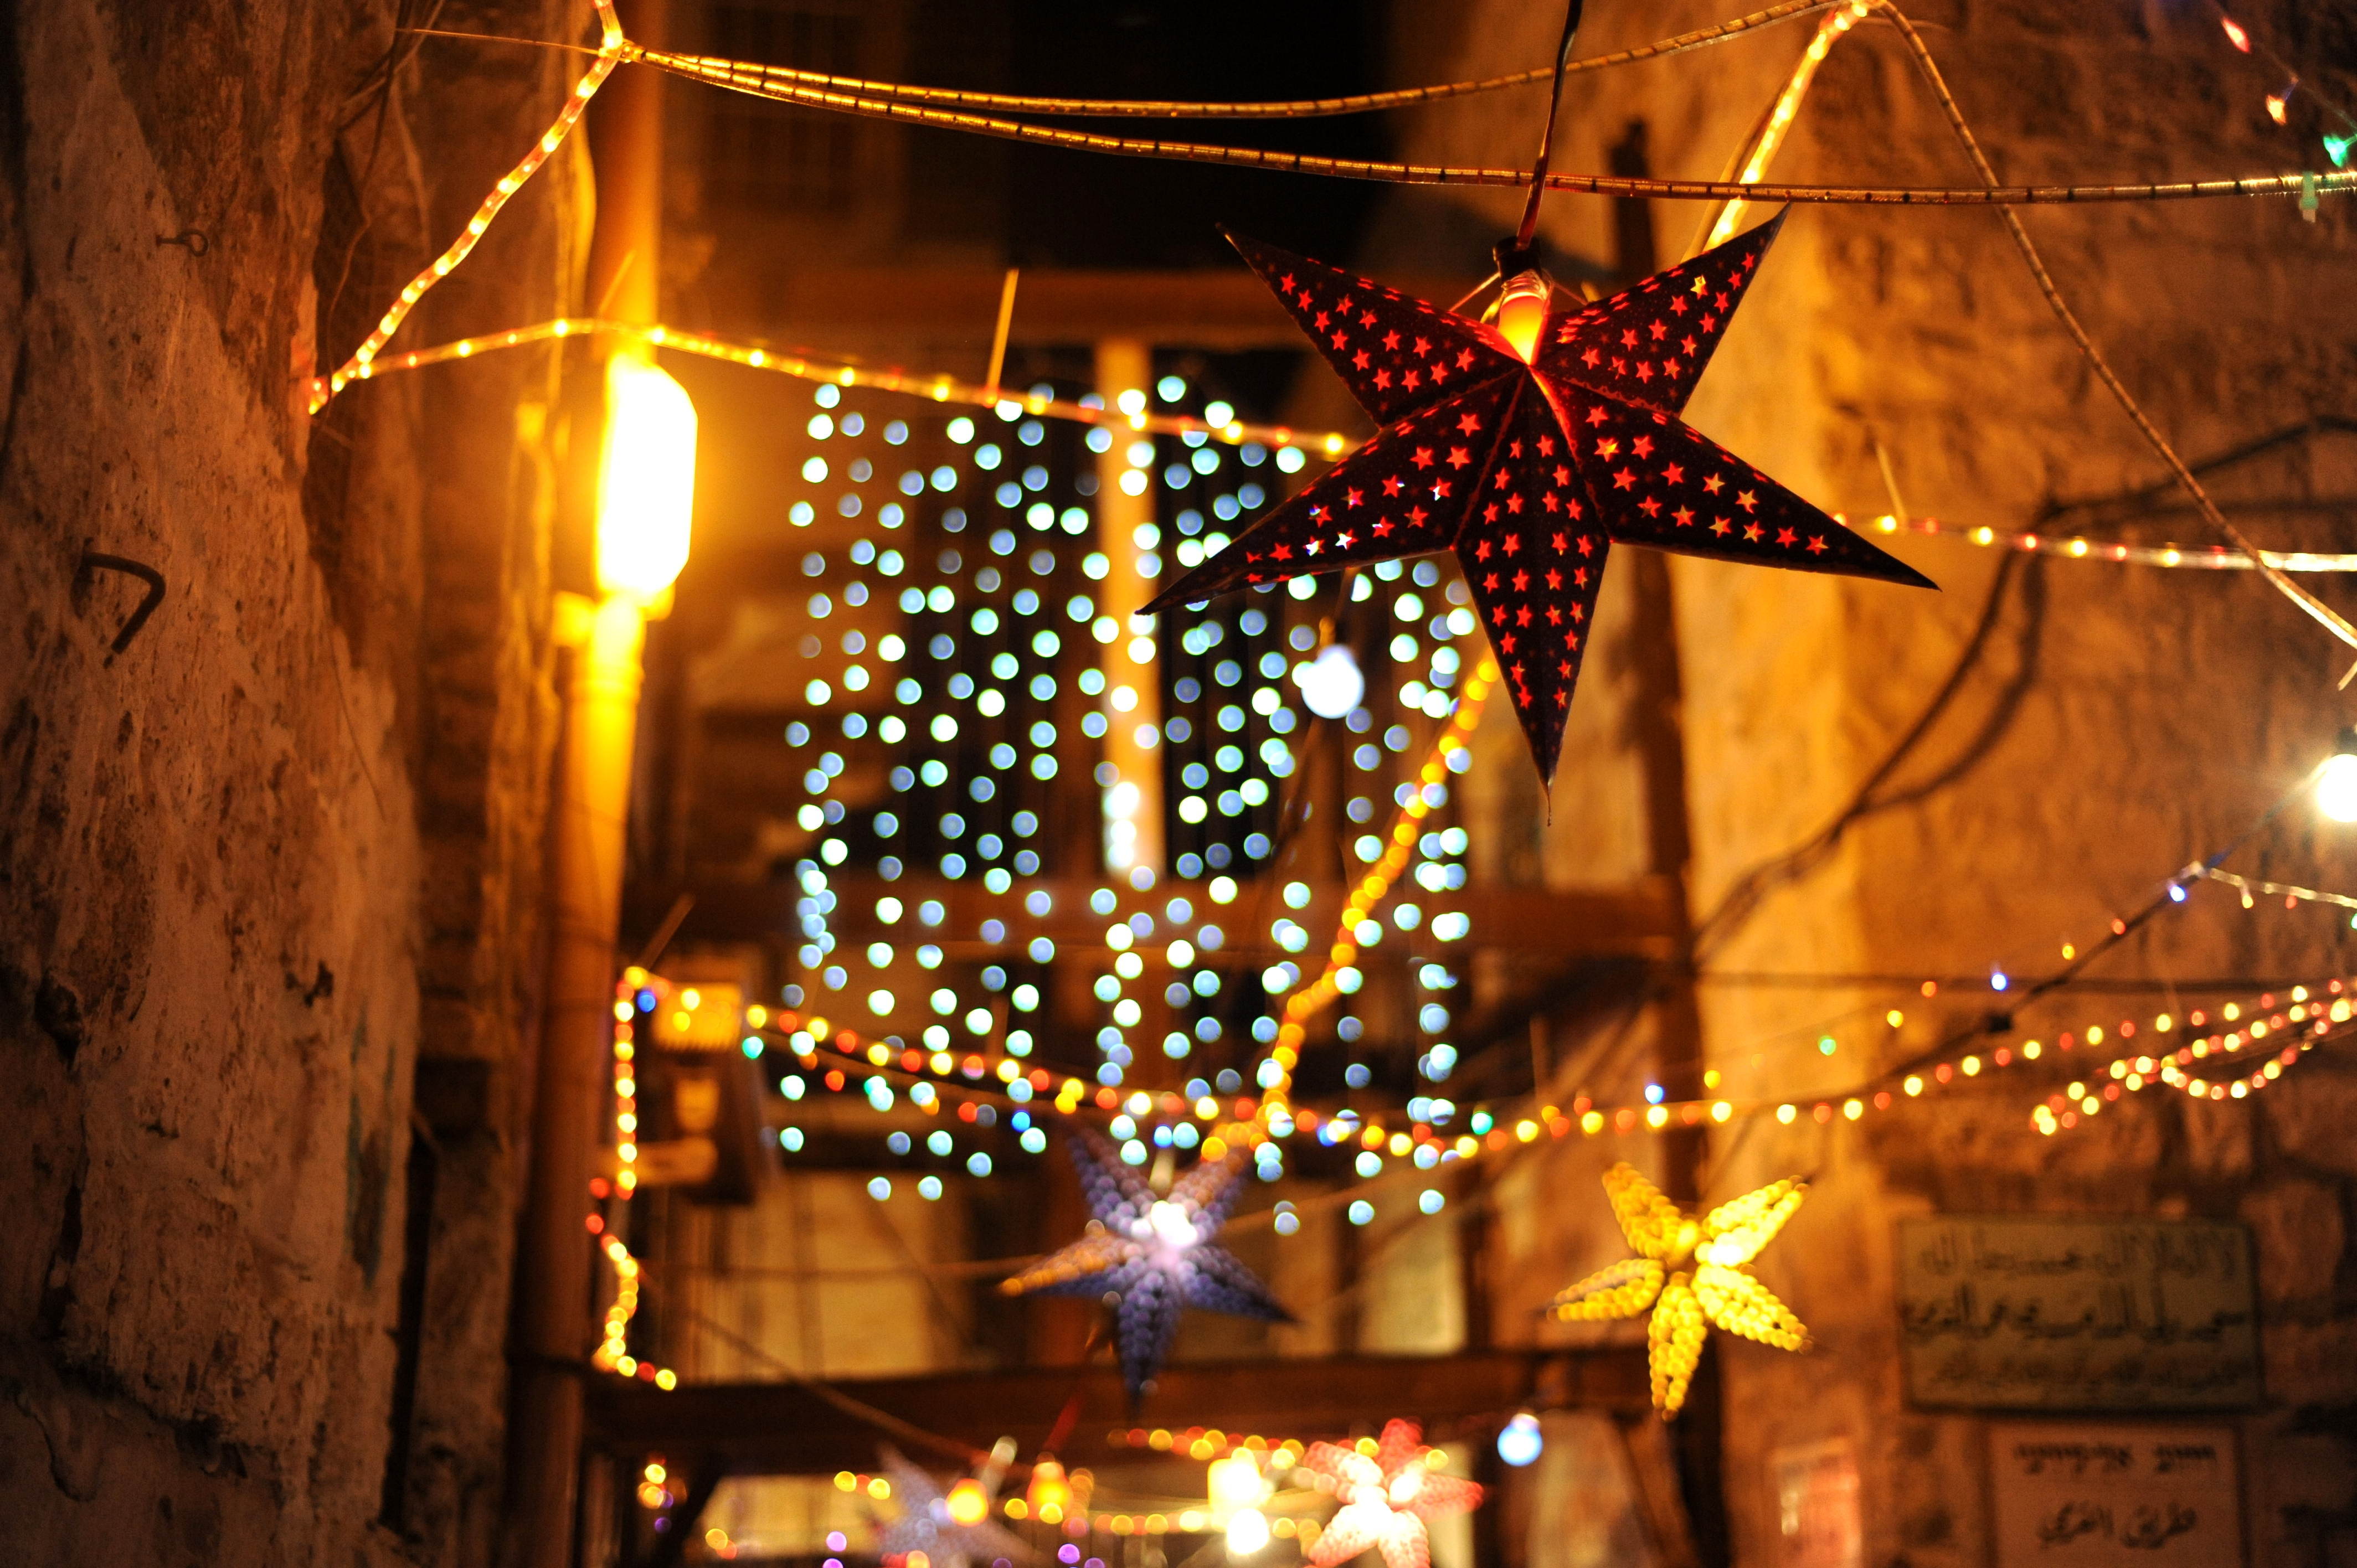 Beautiful 1 Day Ramadan Decor - Ramadan_decorations  Image_151356.jpg